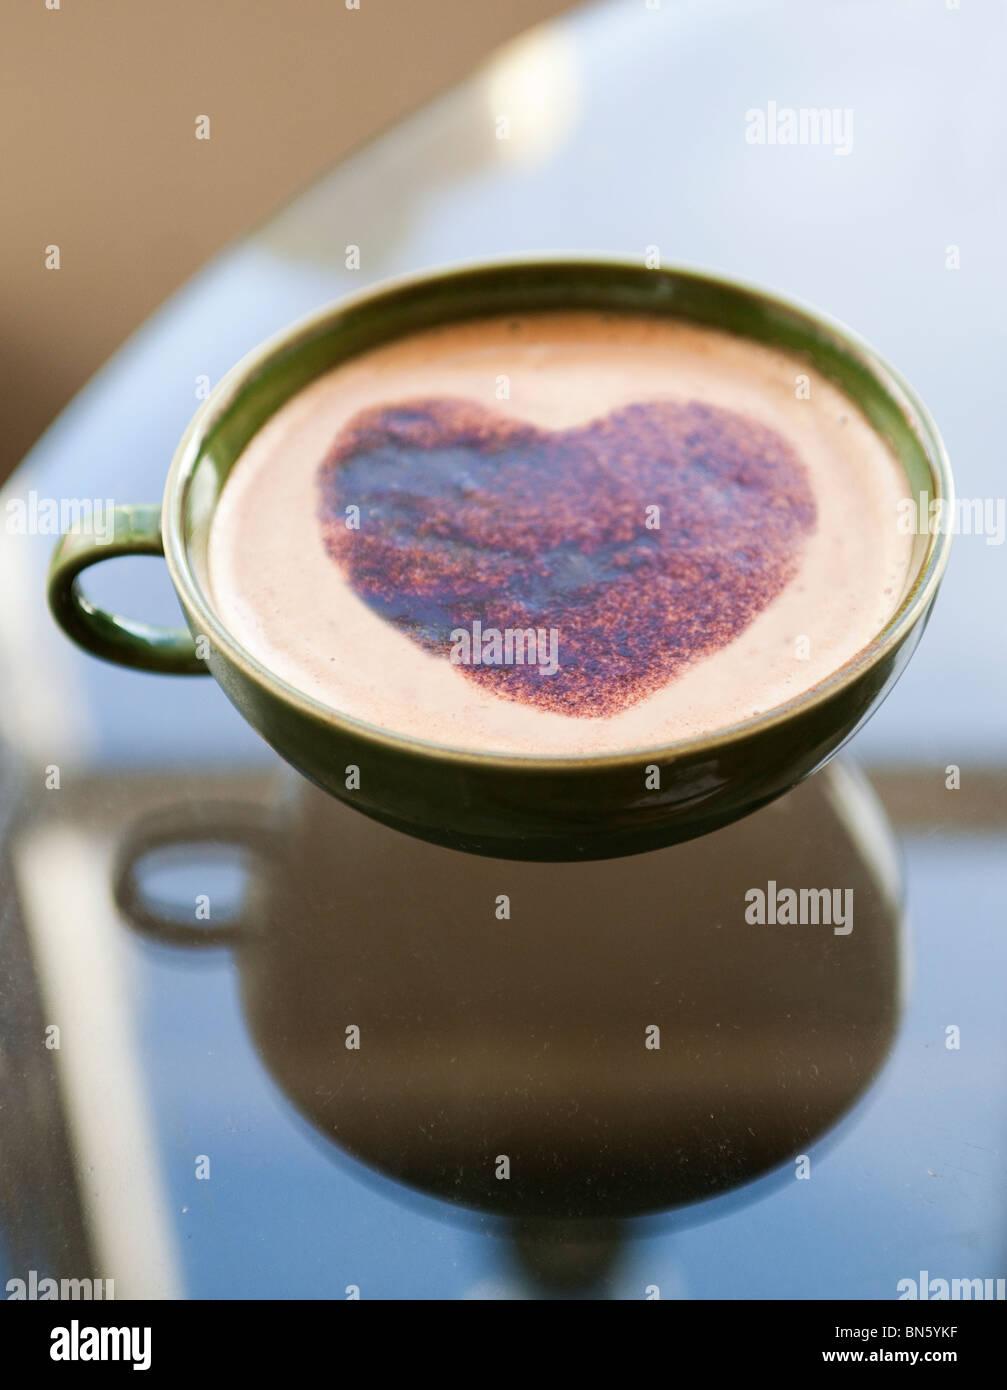 Herz auf Kaffeetasse Stockbild